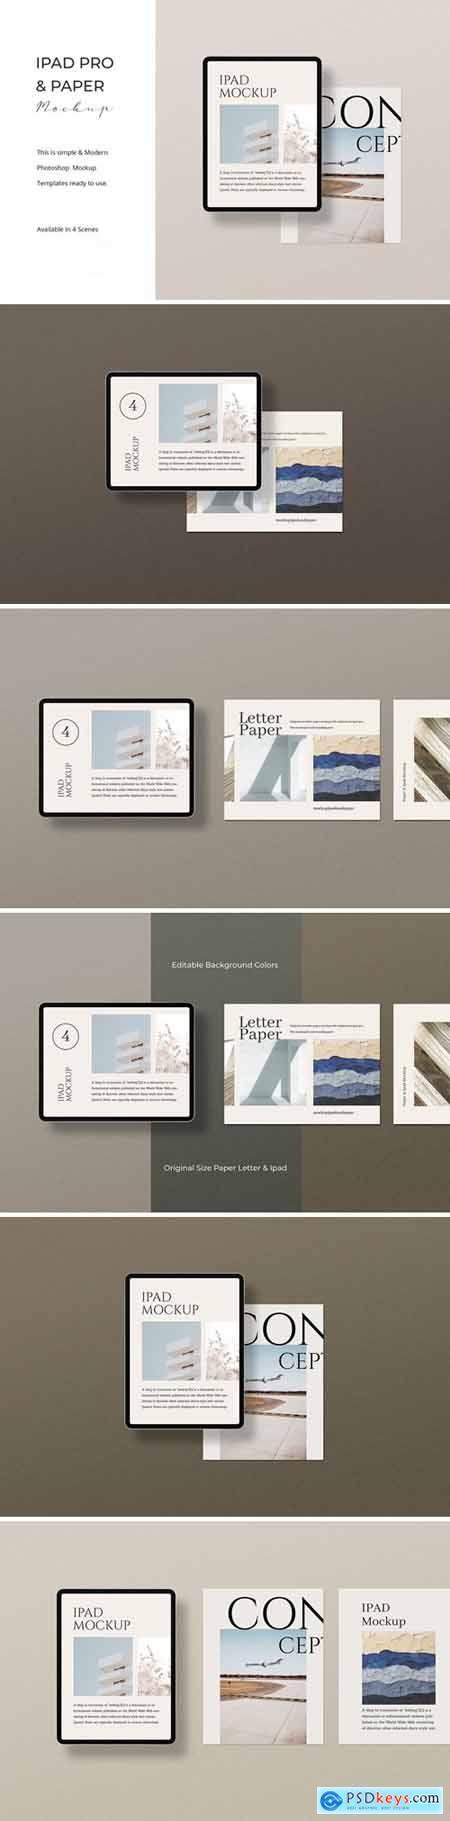 Ipad Pro & Paper Mockup